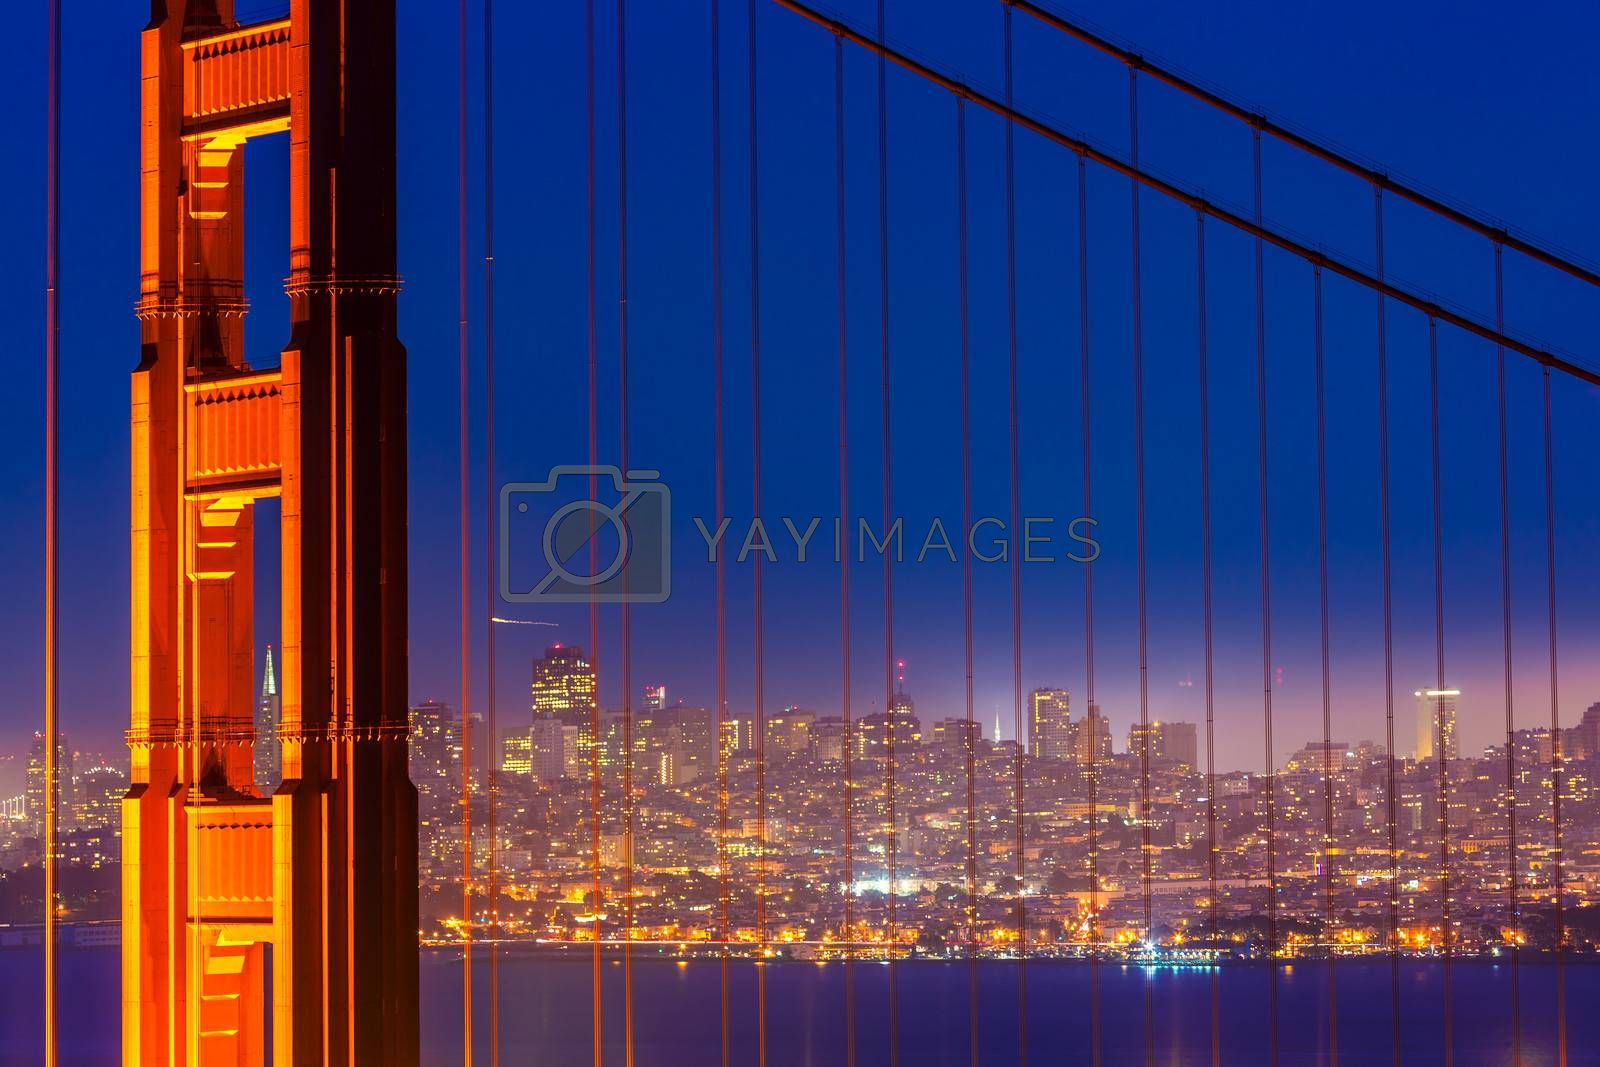 Royalty free image of San Francisco Golden Gate Bridge sunset through cables by lunamarina